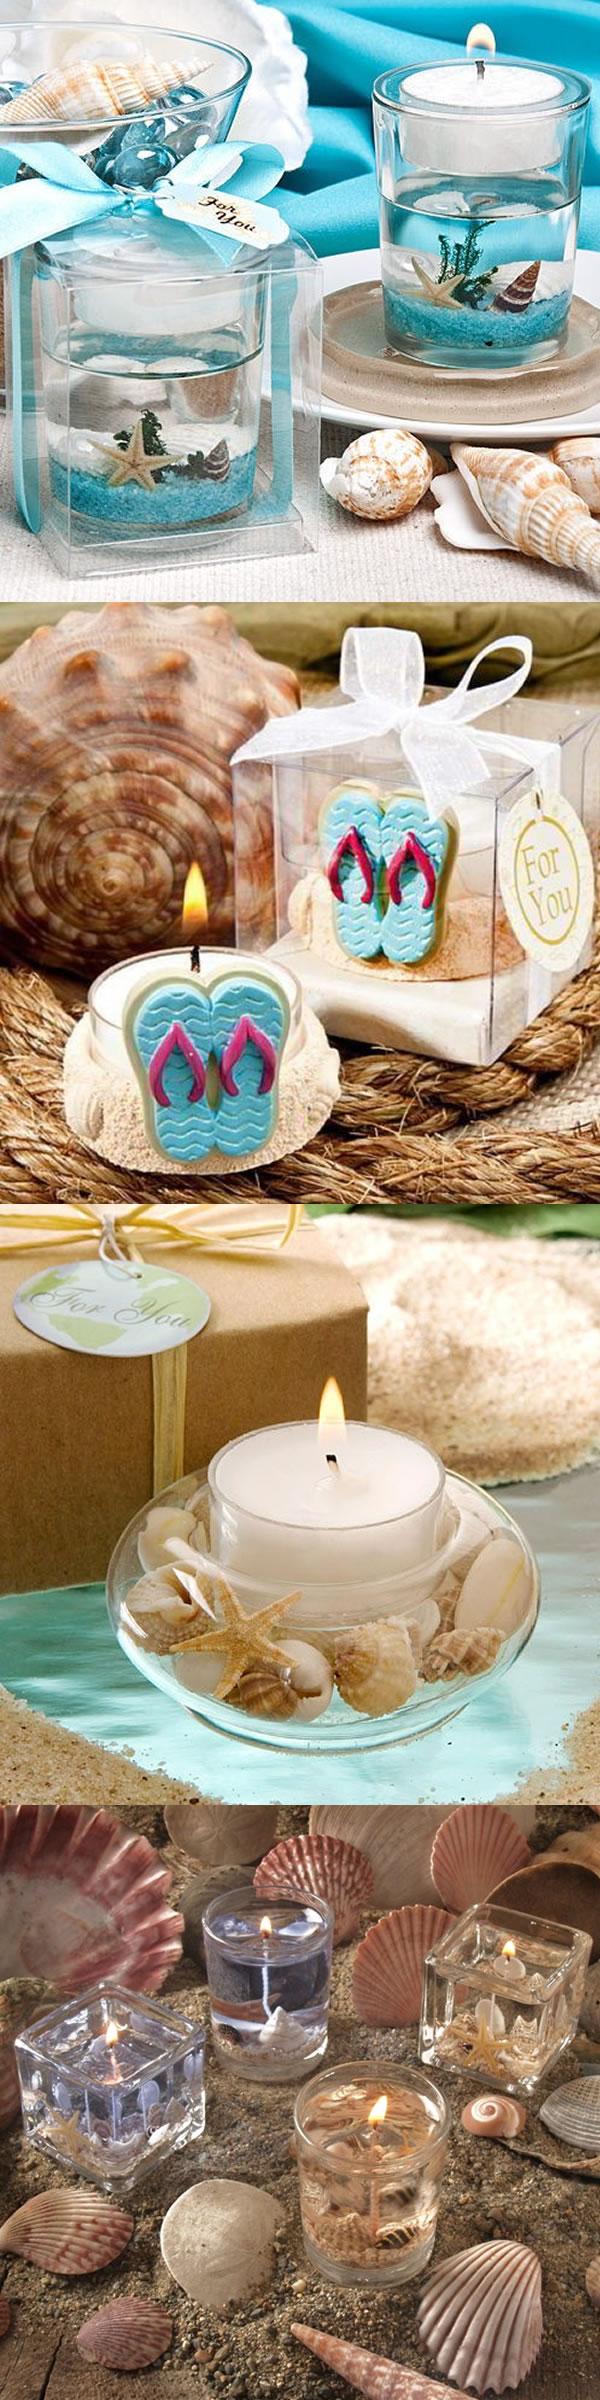 beach wedding candles decor beach wedding ideas pinterest